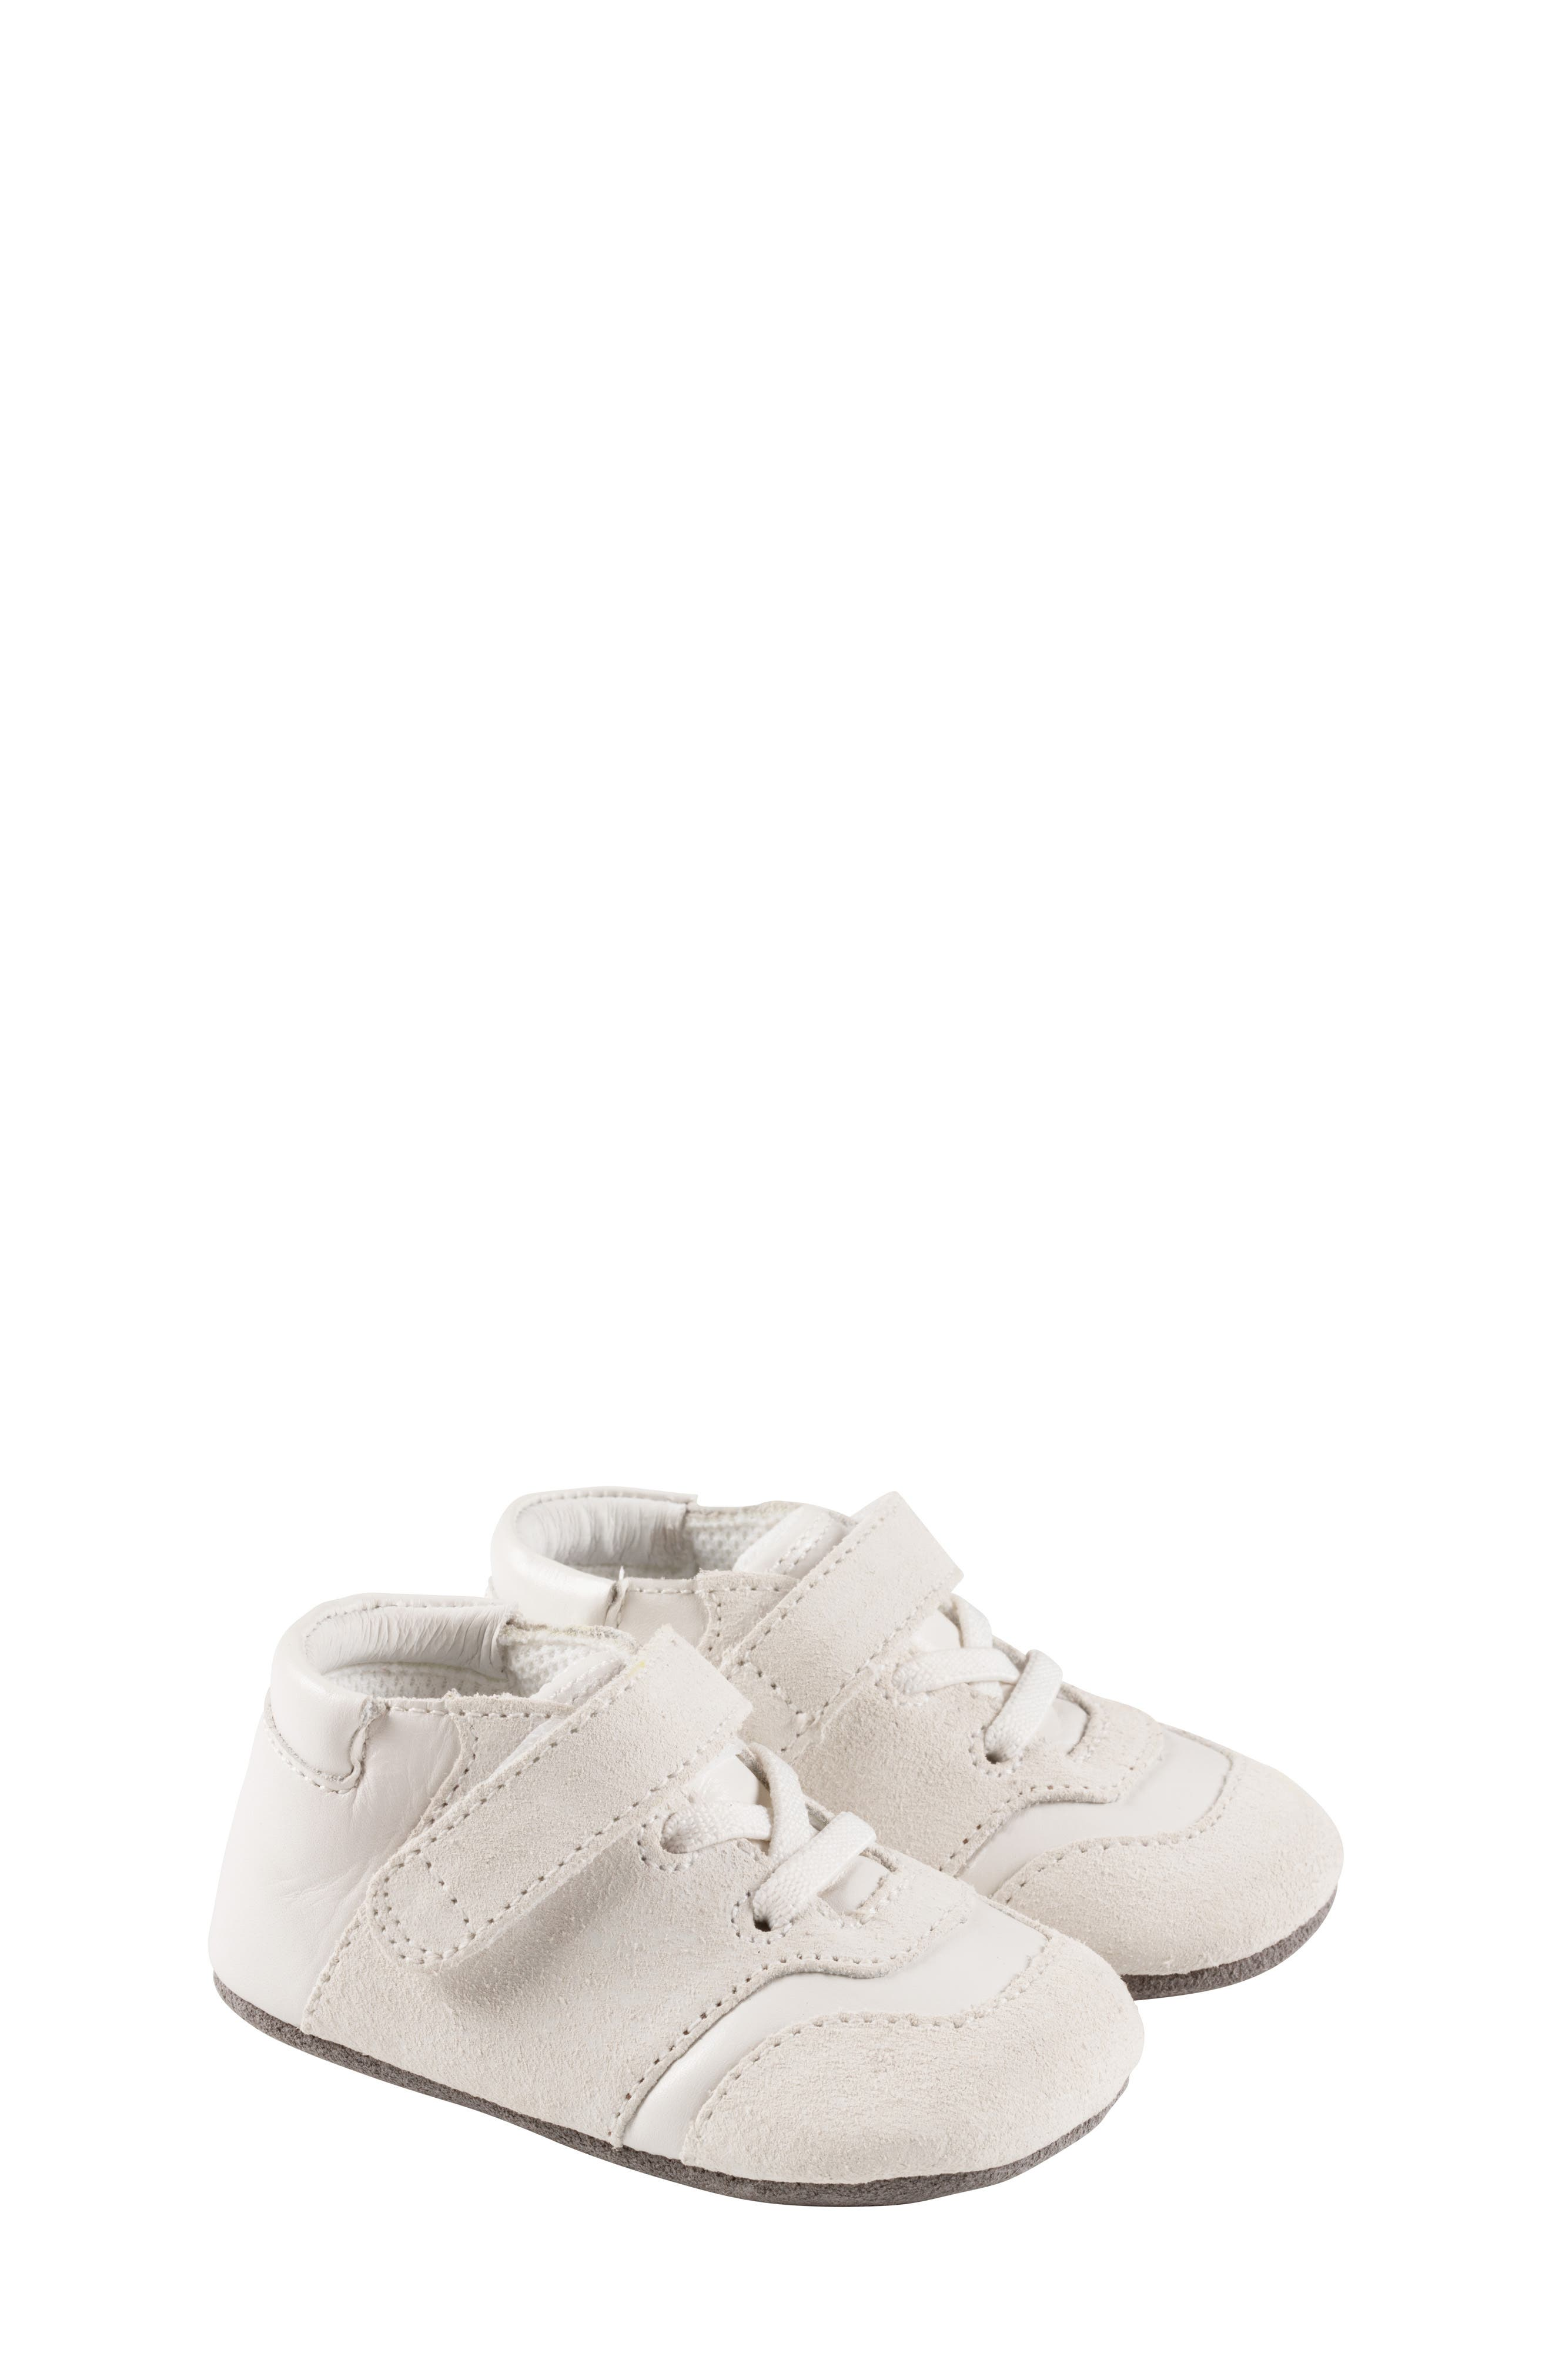 Toddler Robeez Oakley Crib Sneaker